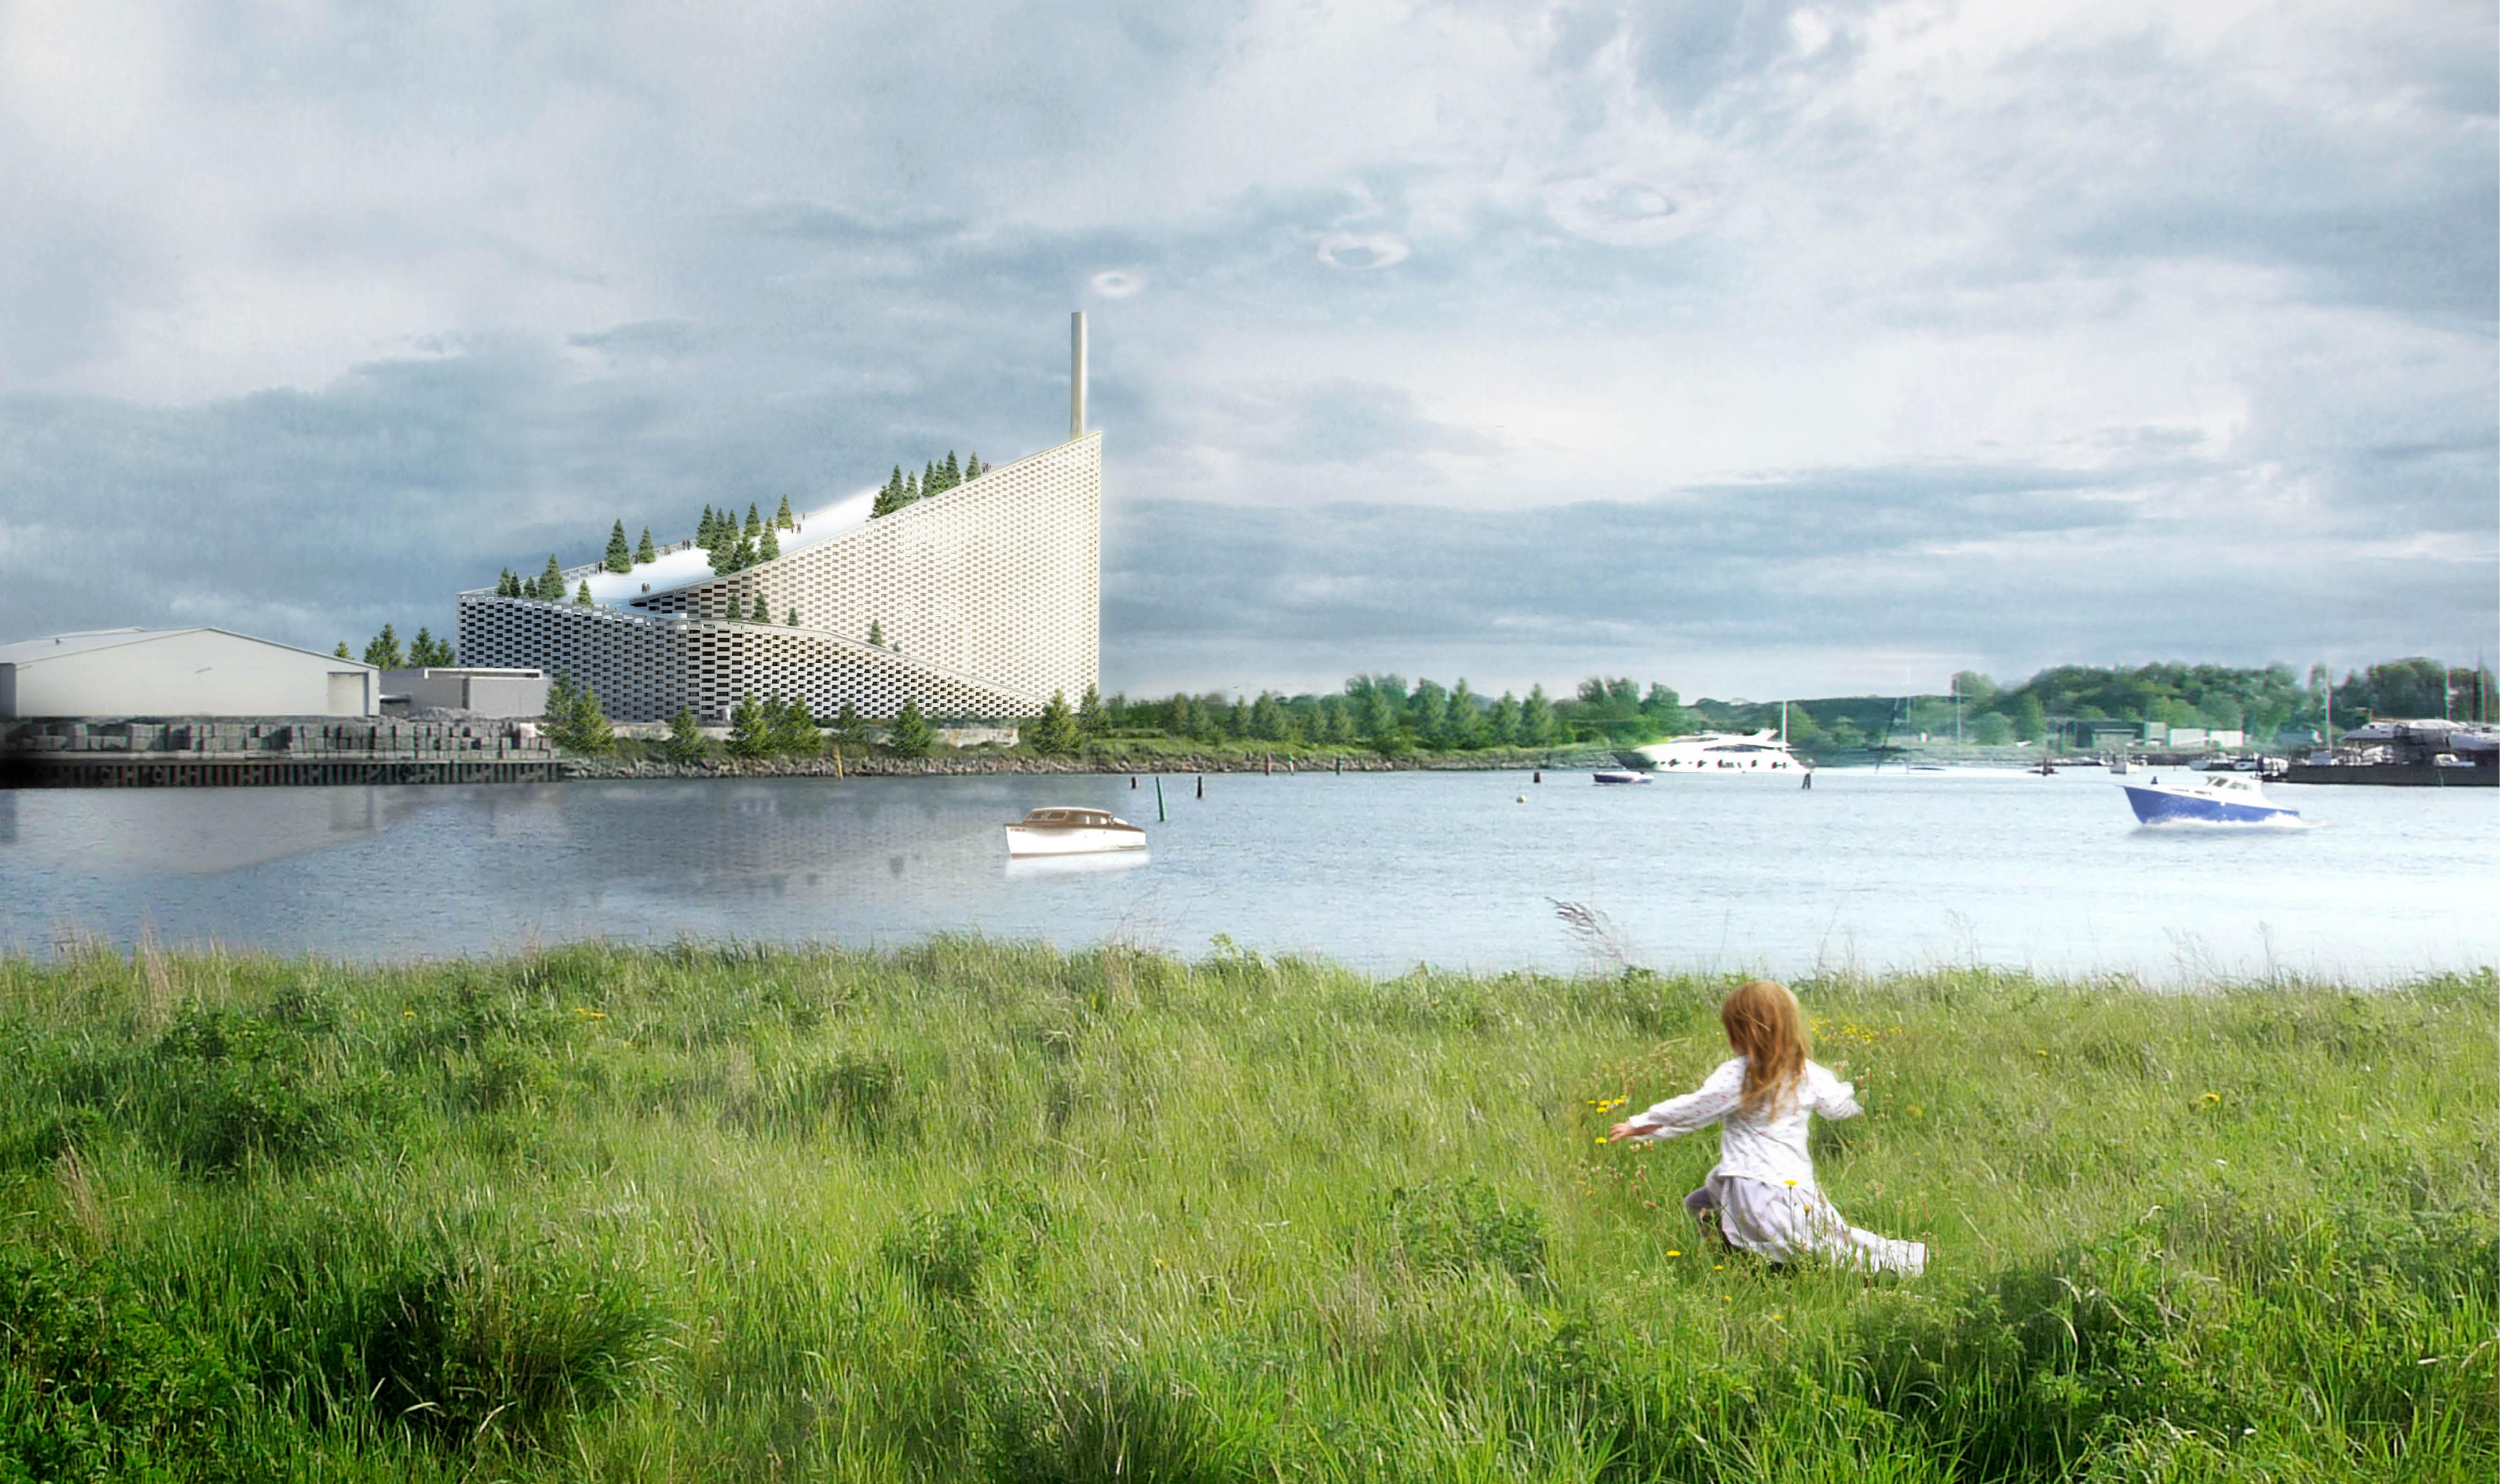 Rendering of Amager Bakke/CopenHill by Bjarke Ingels Group